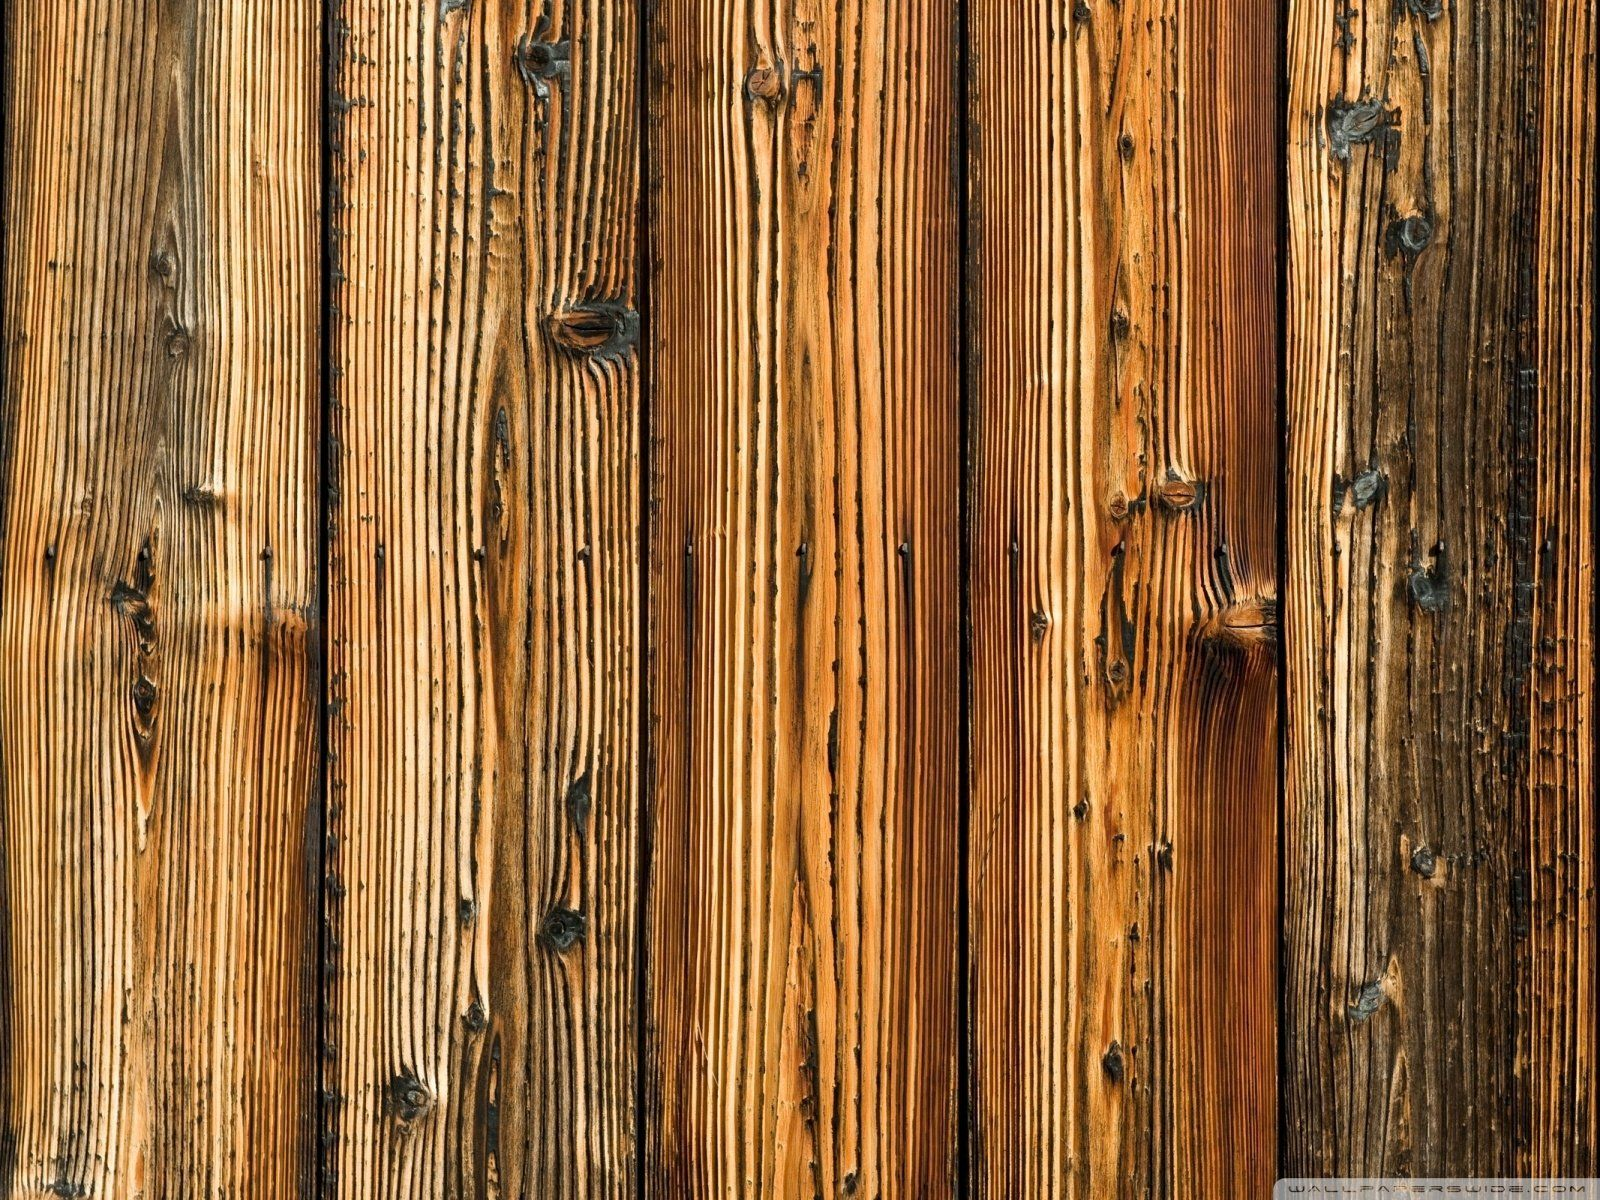 HD Wood Wallpapers - Top Free HD Wood